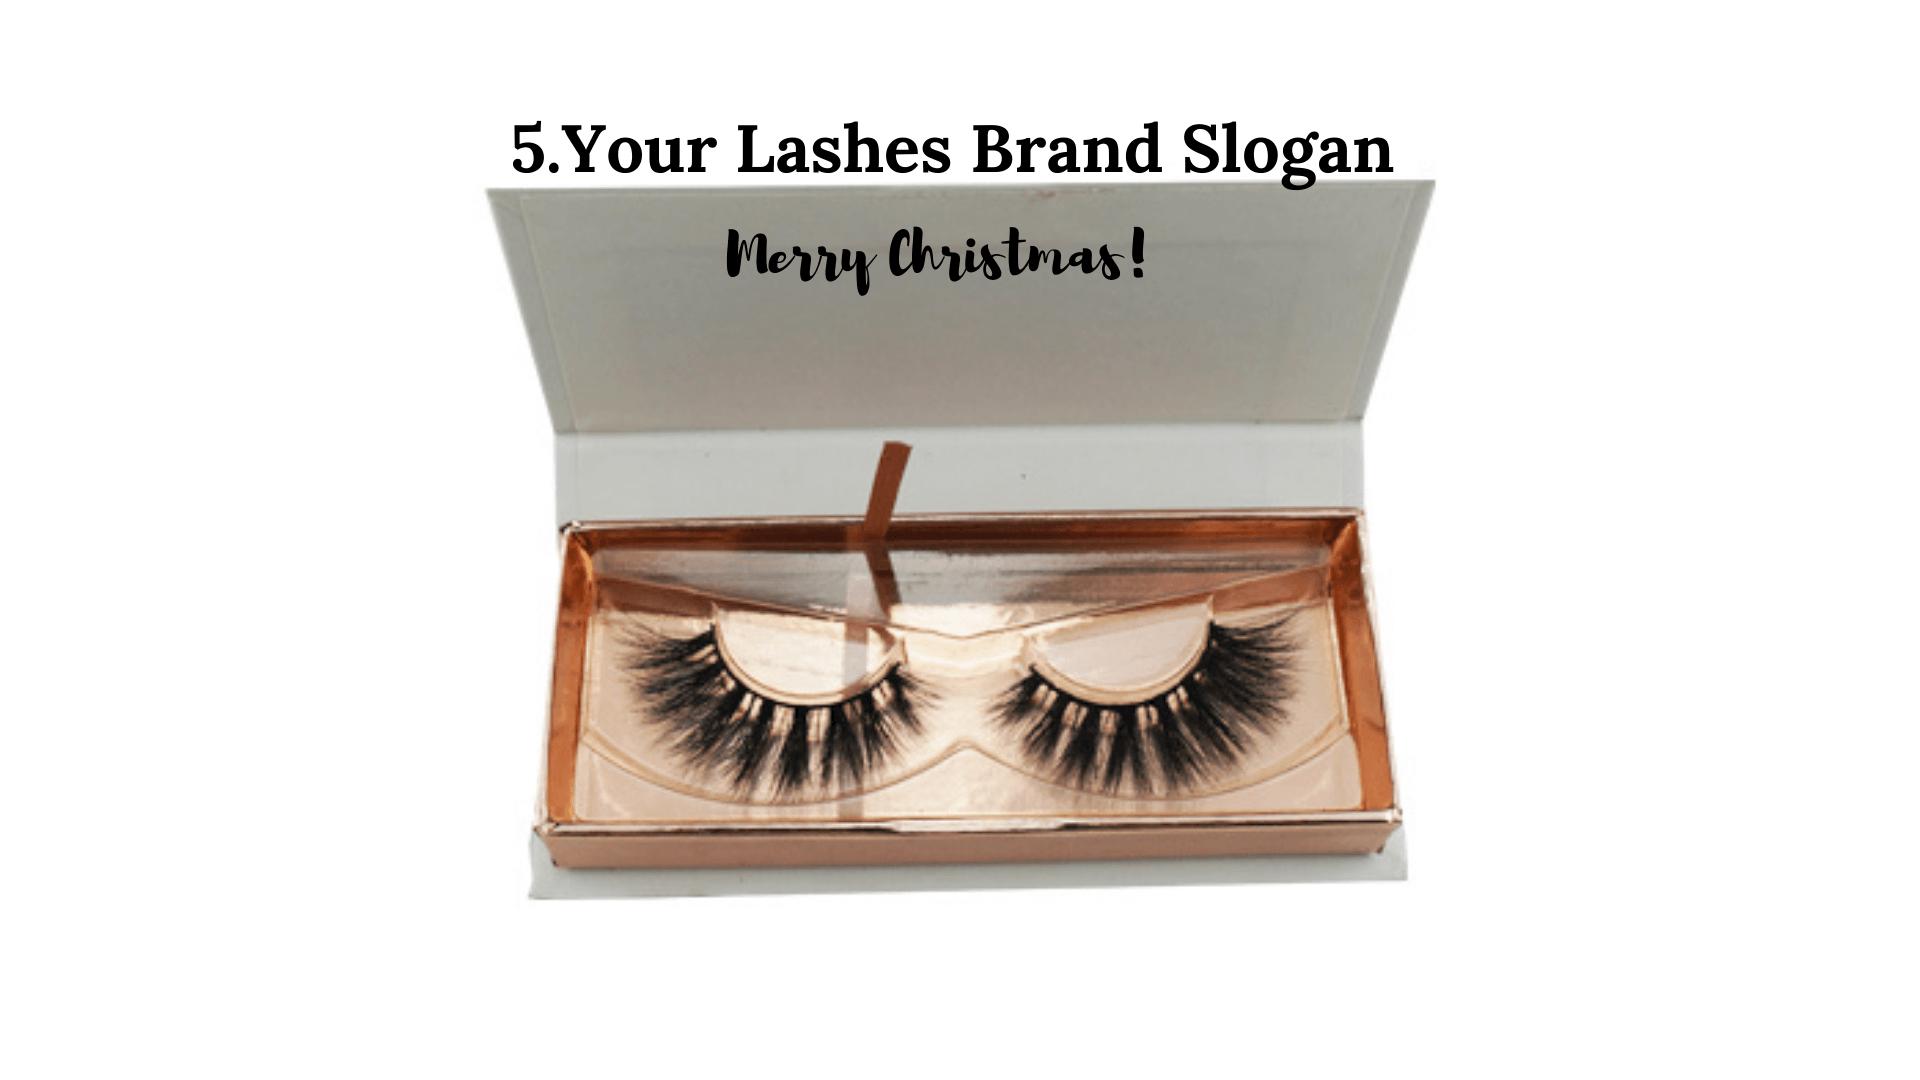 lashes brand slogan